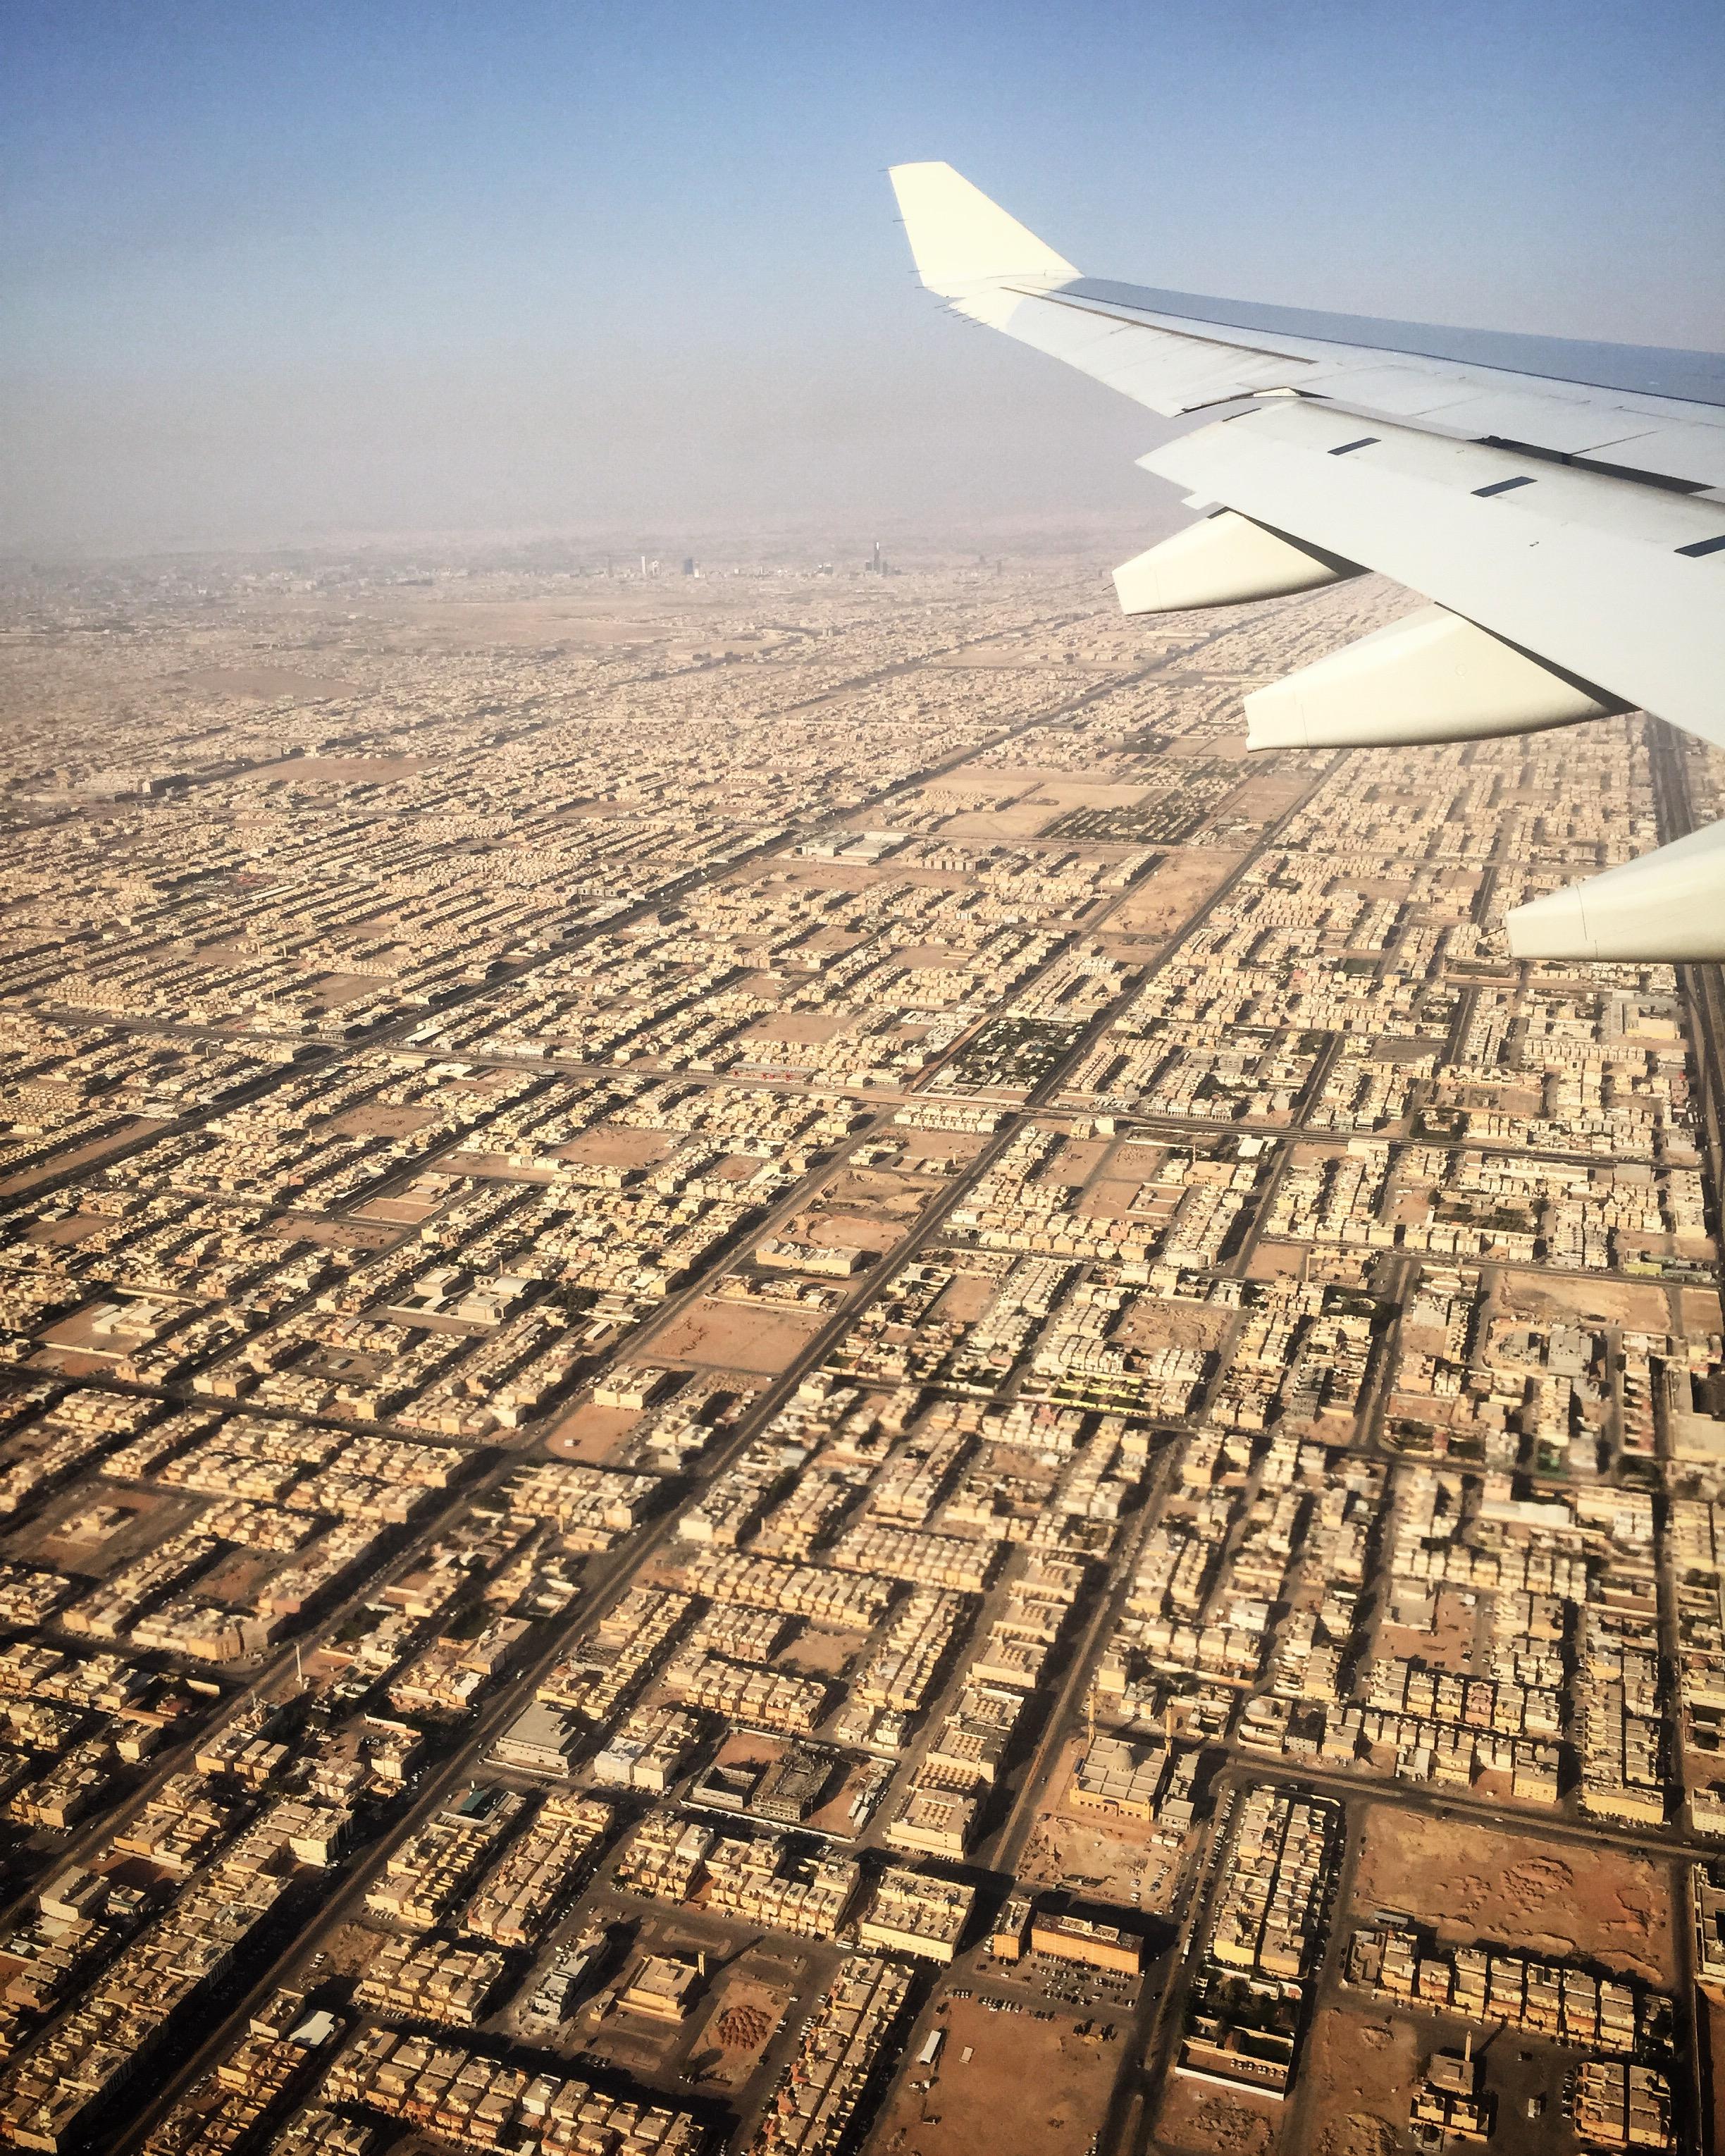 Landing in Riyadh, Saudi Arabia